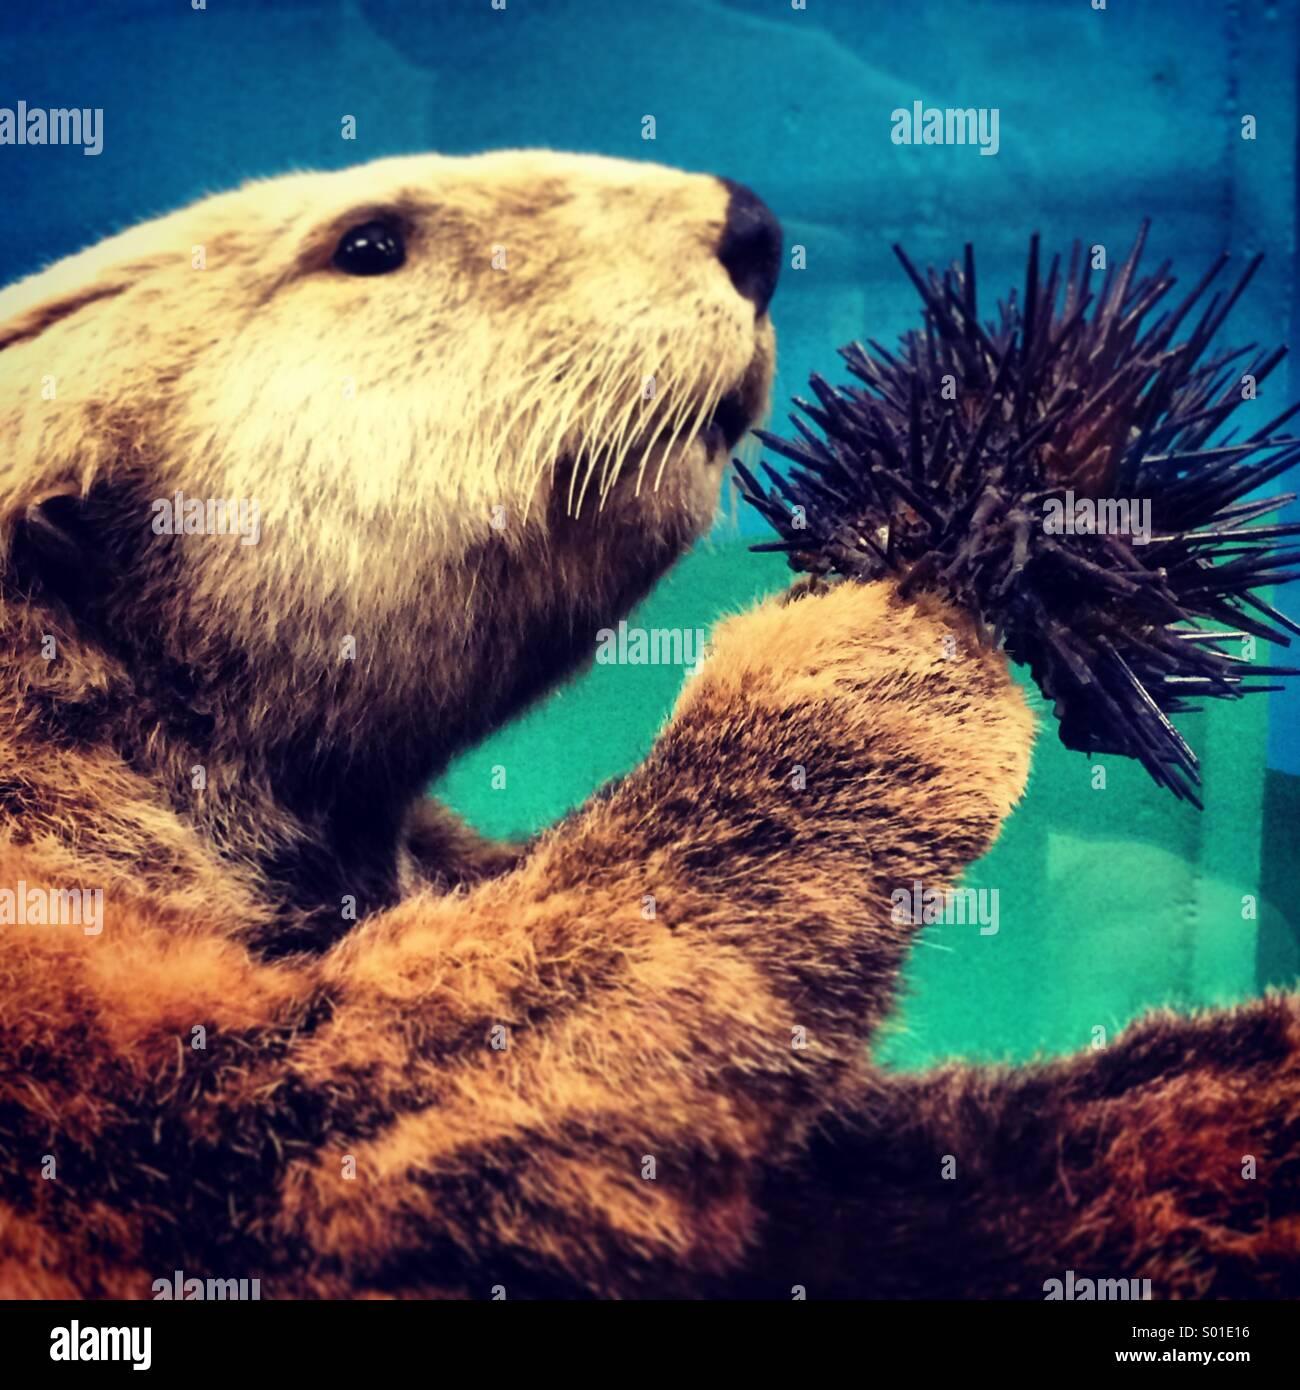 Sea Otter Essen Seeigel Stockbild